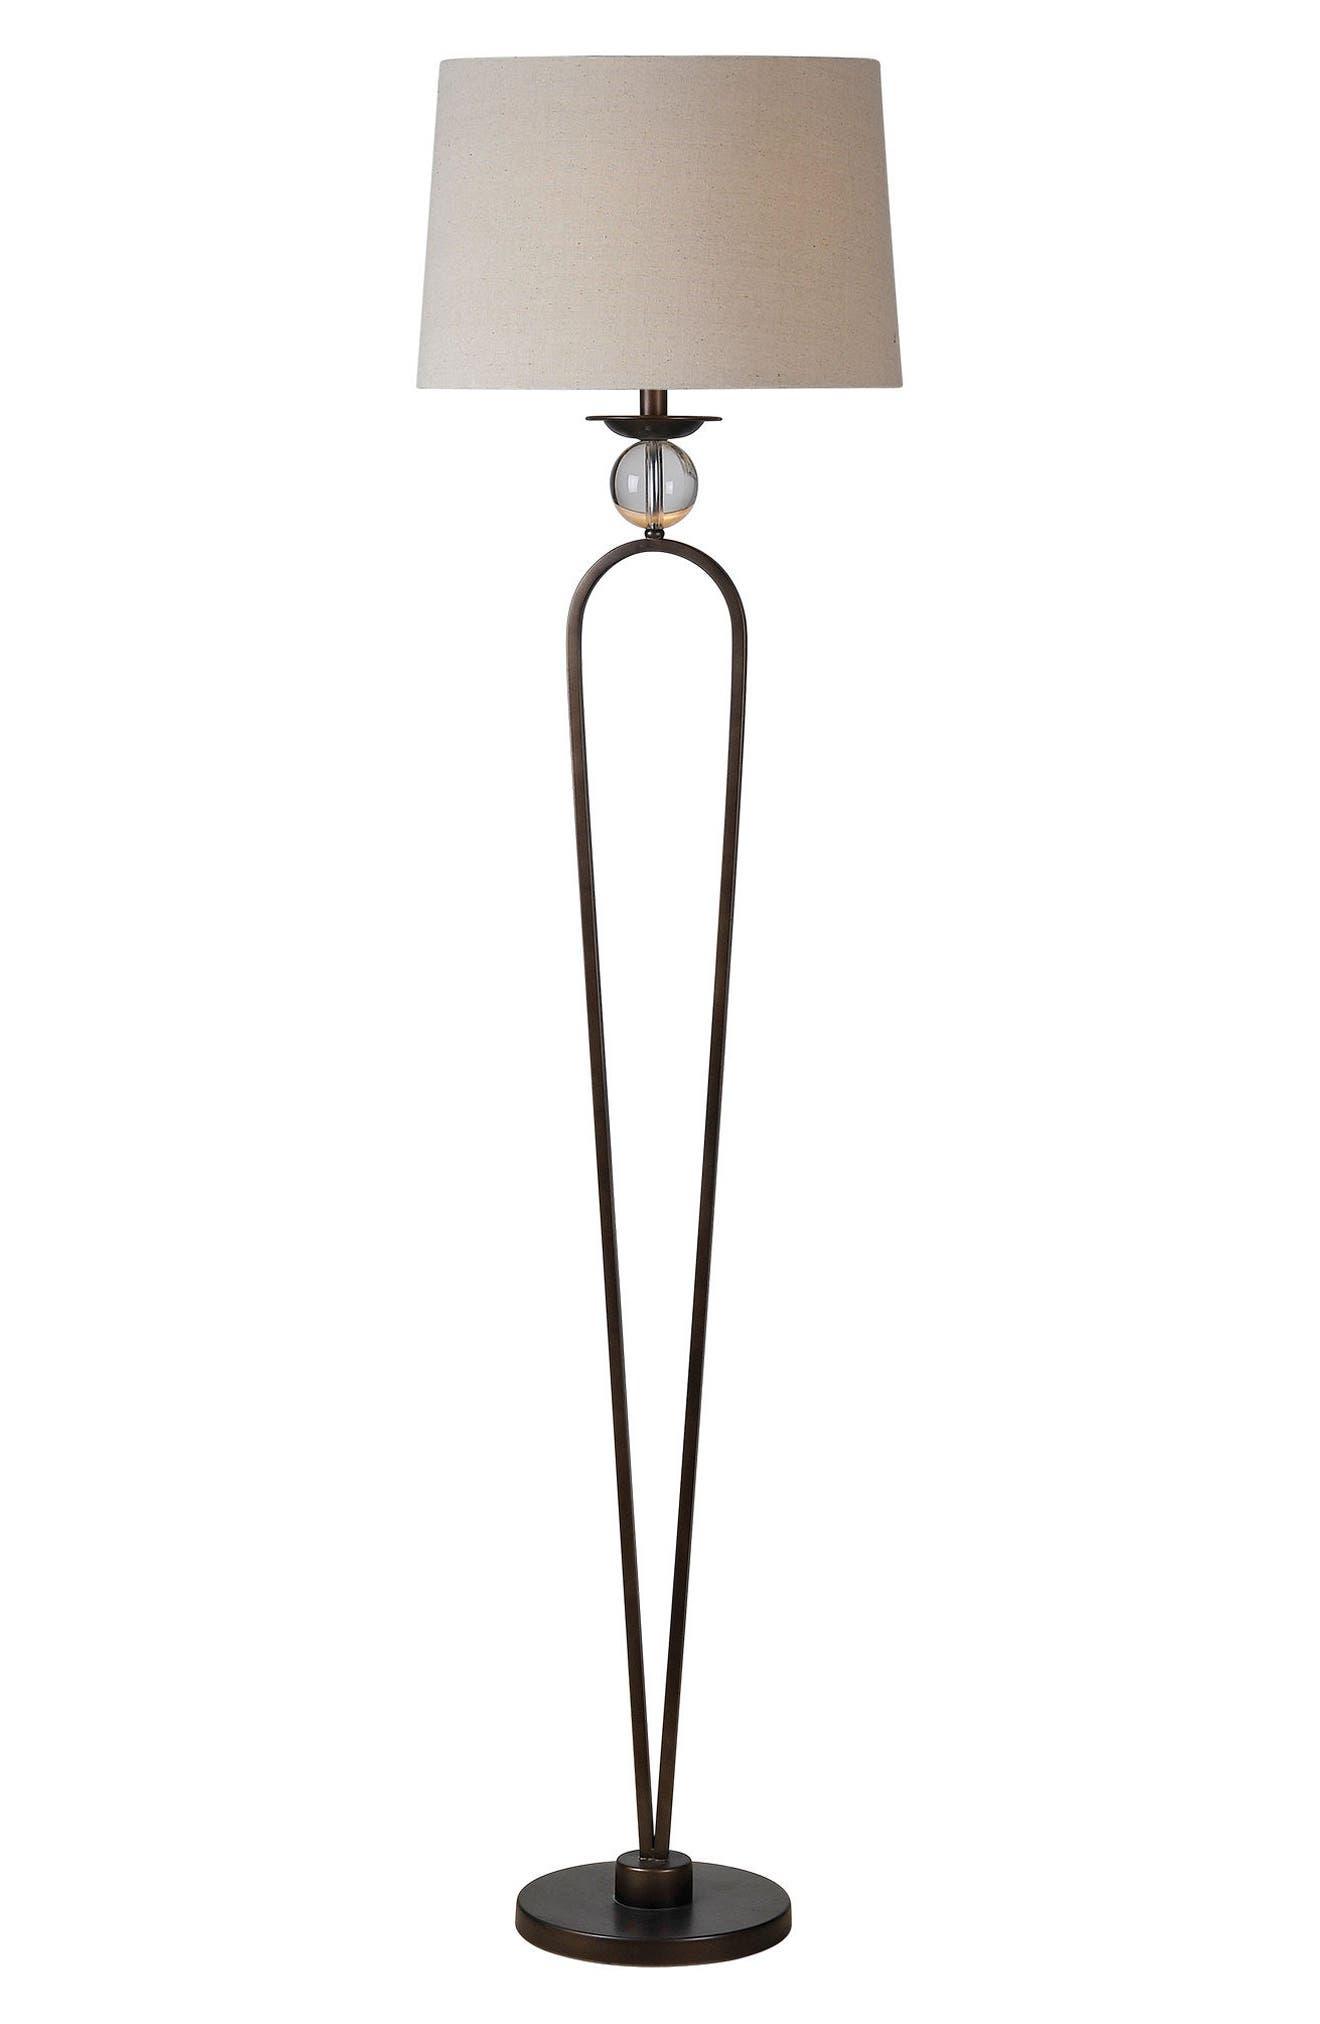 Pembroke Floor Lamp,                             Main thumbnail 1, color,                             Bronze